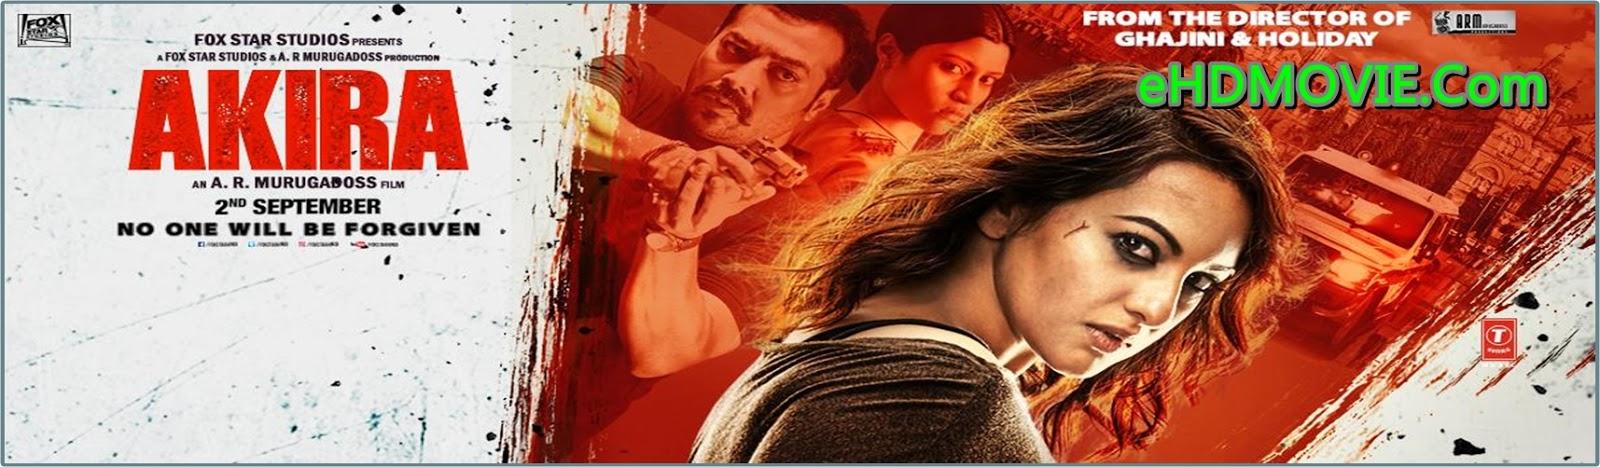 Akira 2016 Full Movie Hindi 720p - 480p ORG HDRip 350MB - 1.3 ESubs Free Download